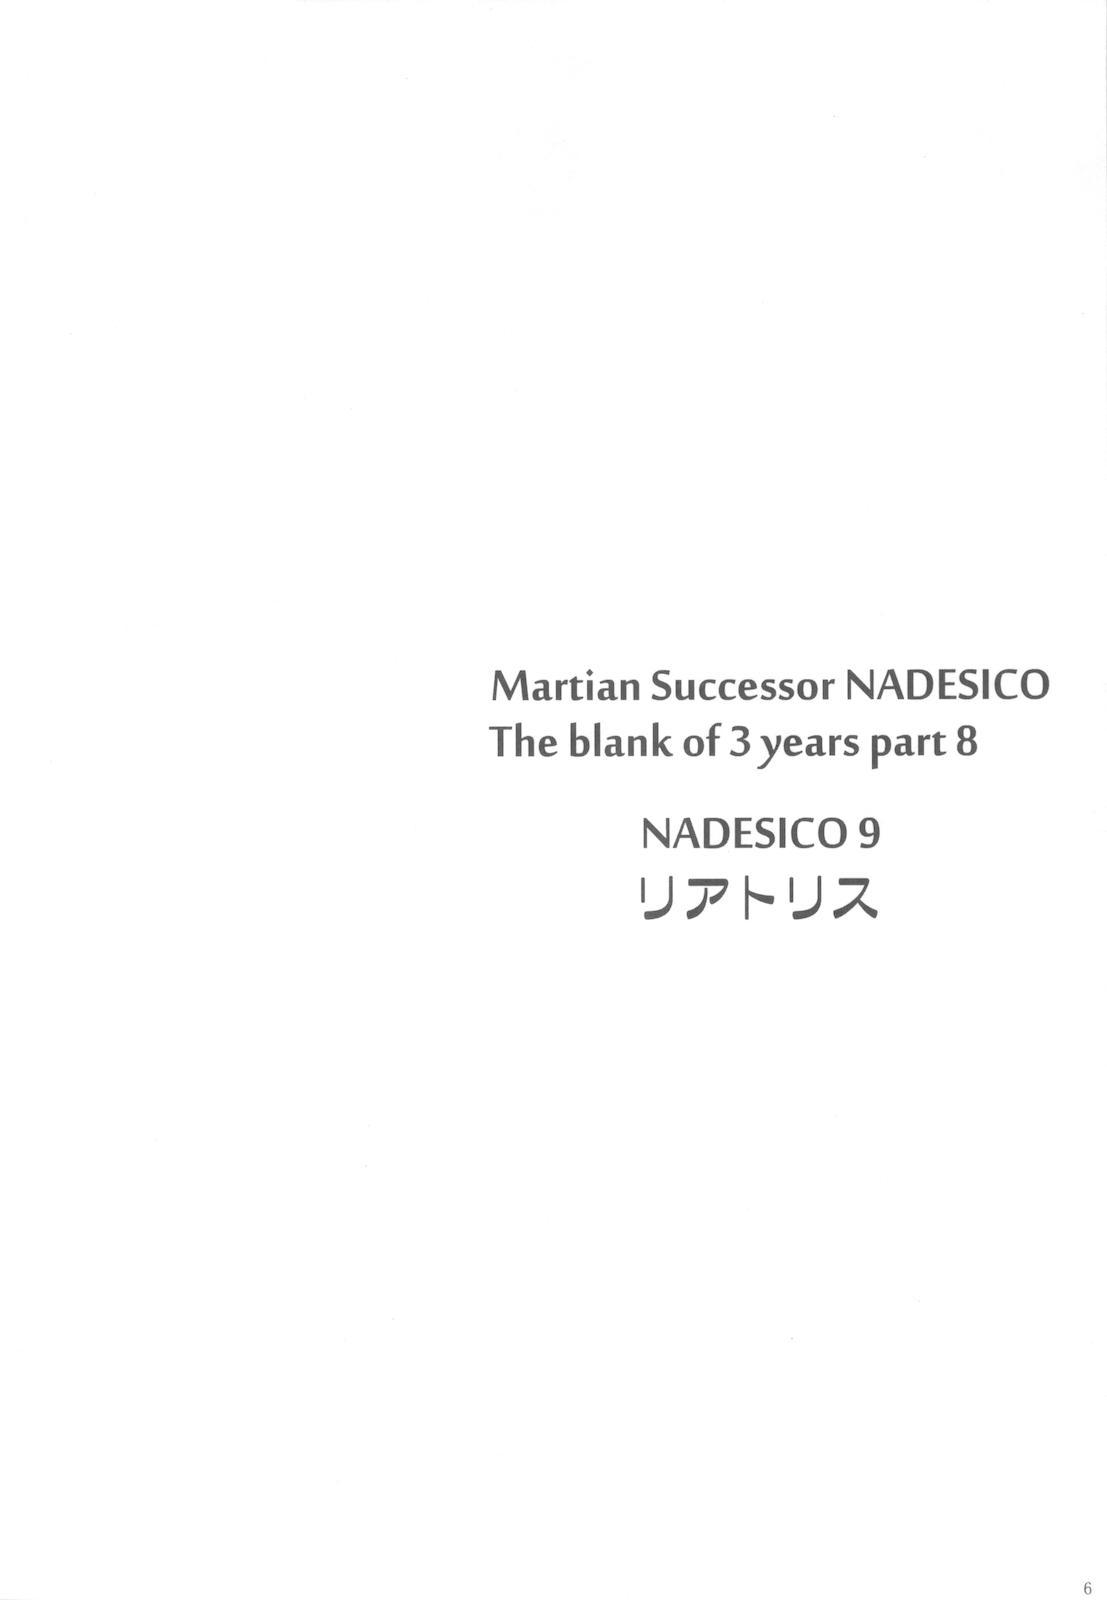 NADESICO 9 Liatris 5